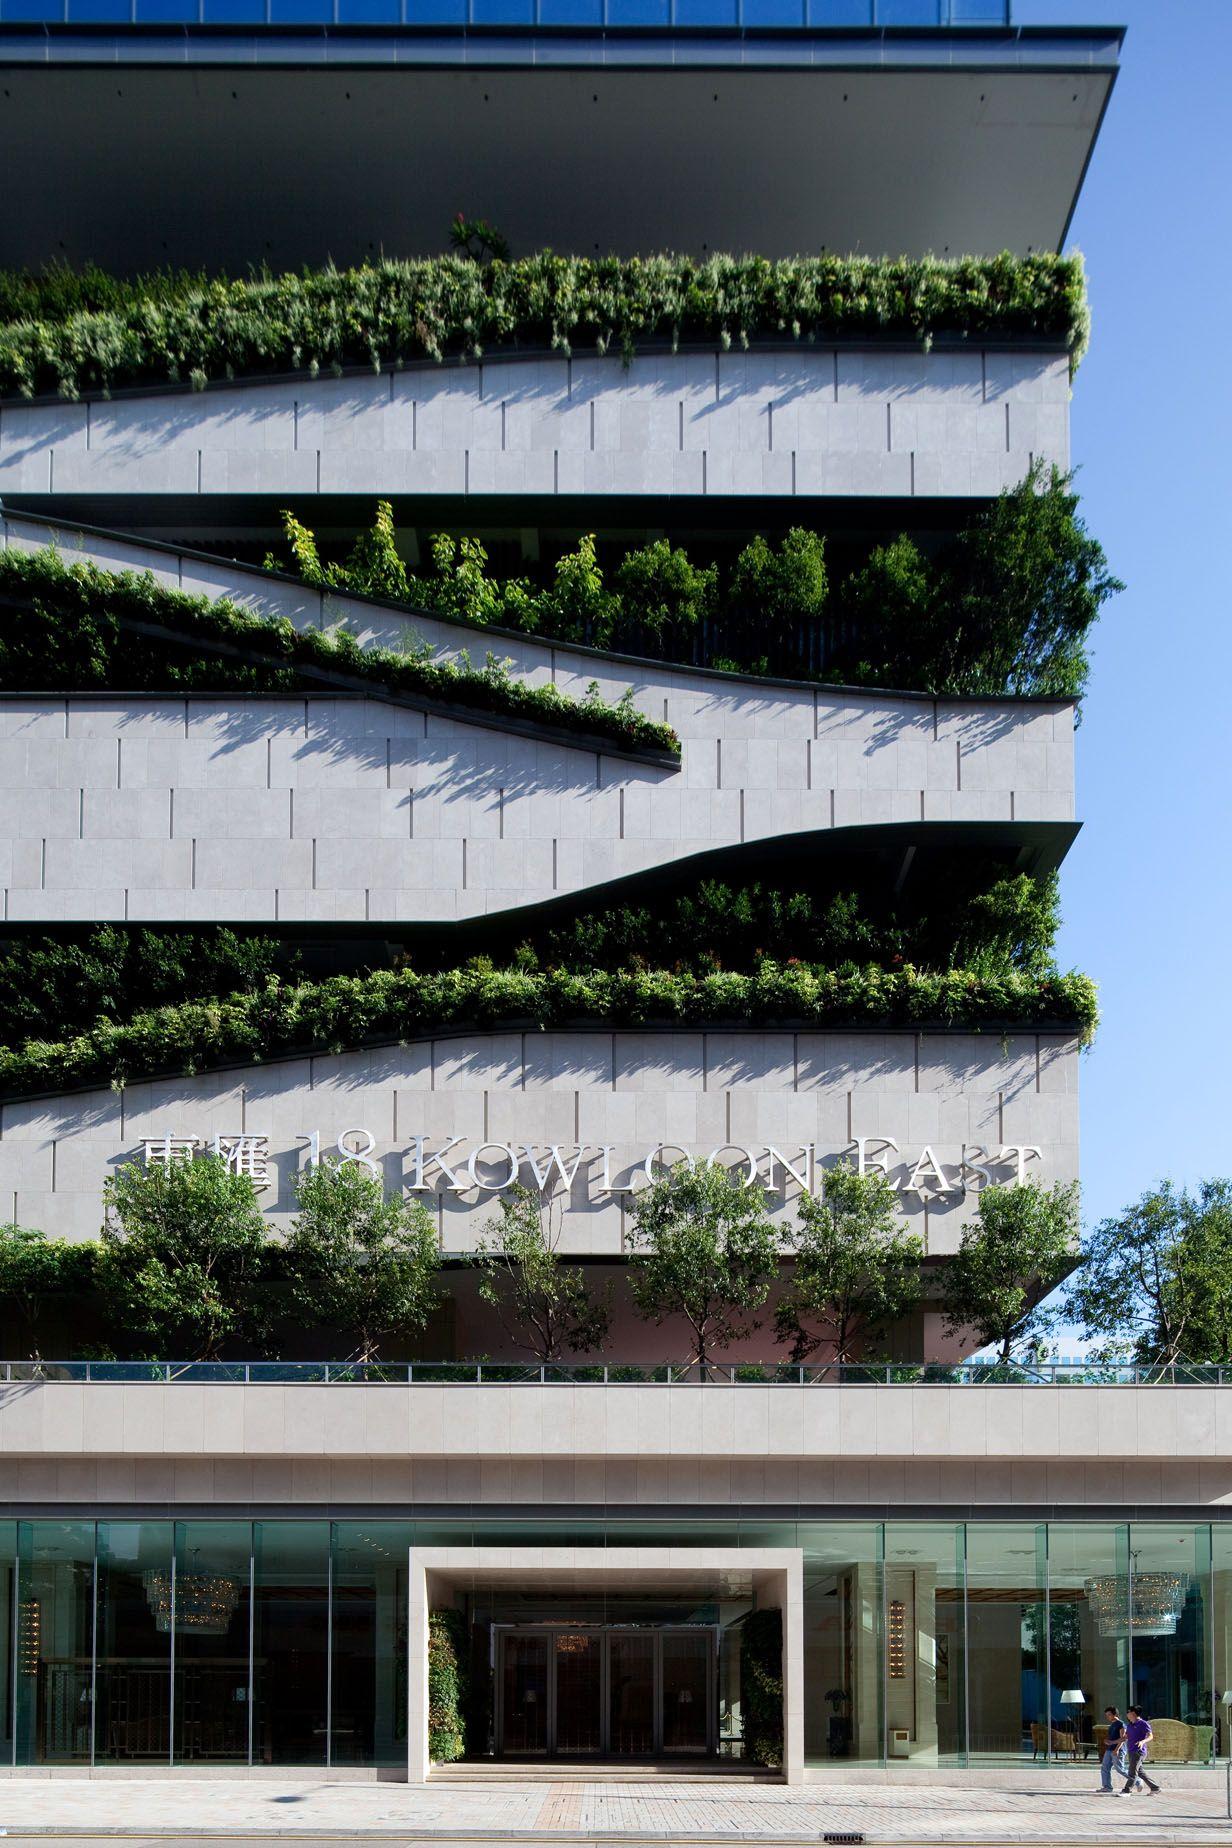 18 Kowloon East Aedas Green Architecture Facade Design Architecture Exterior